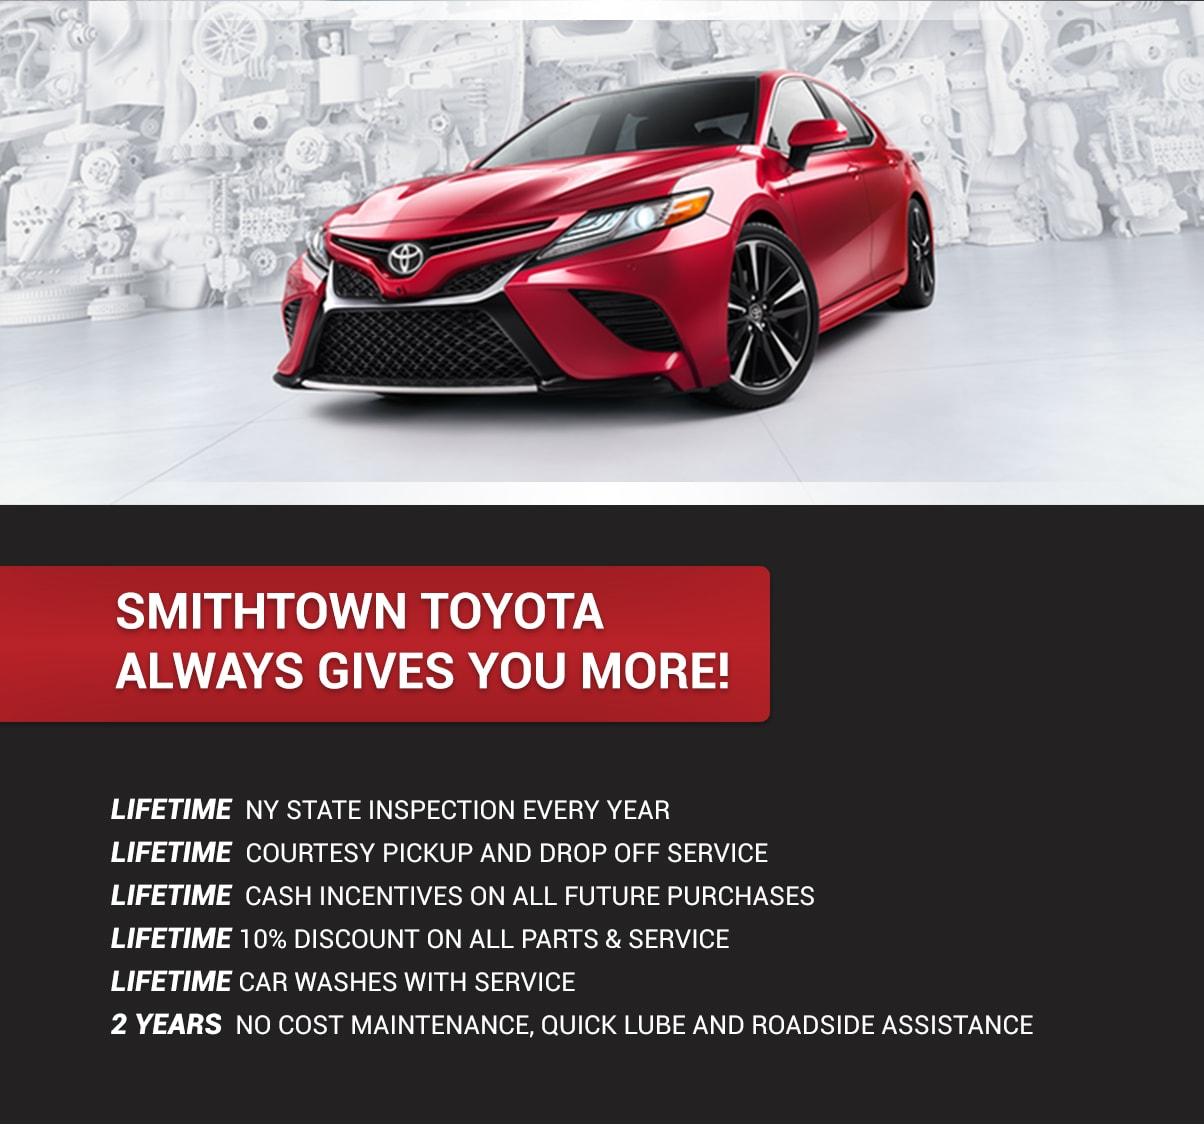 Queens Toyota Dealer: Toyota Camry Dealer Long Island NY